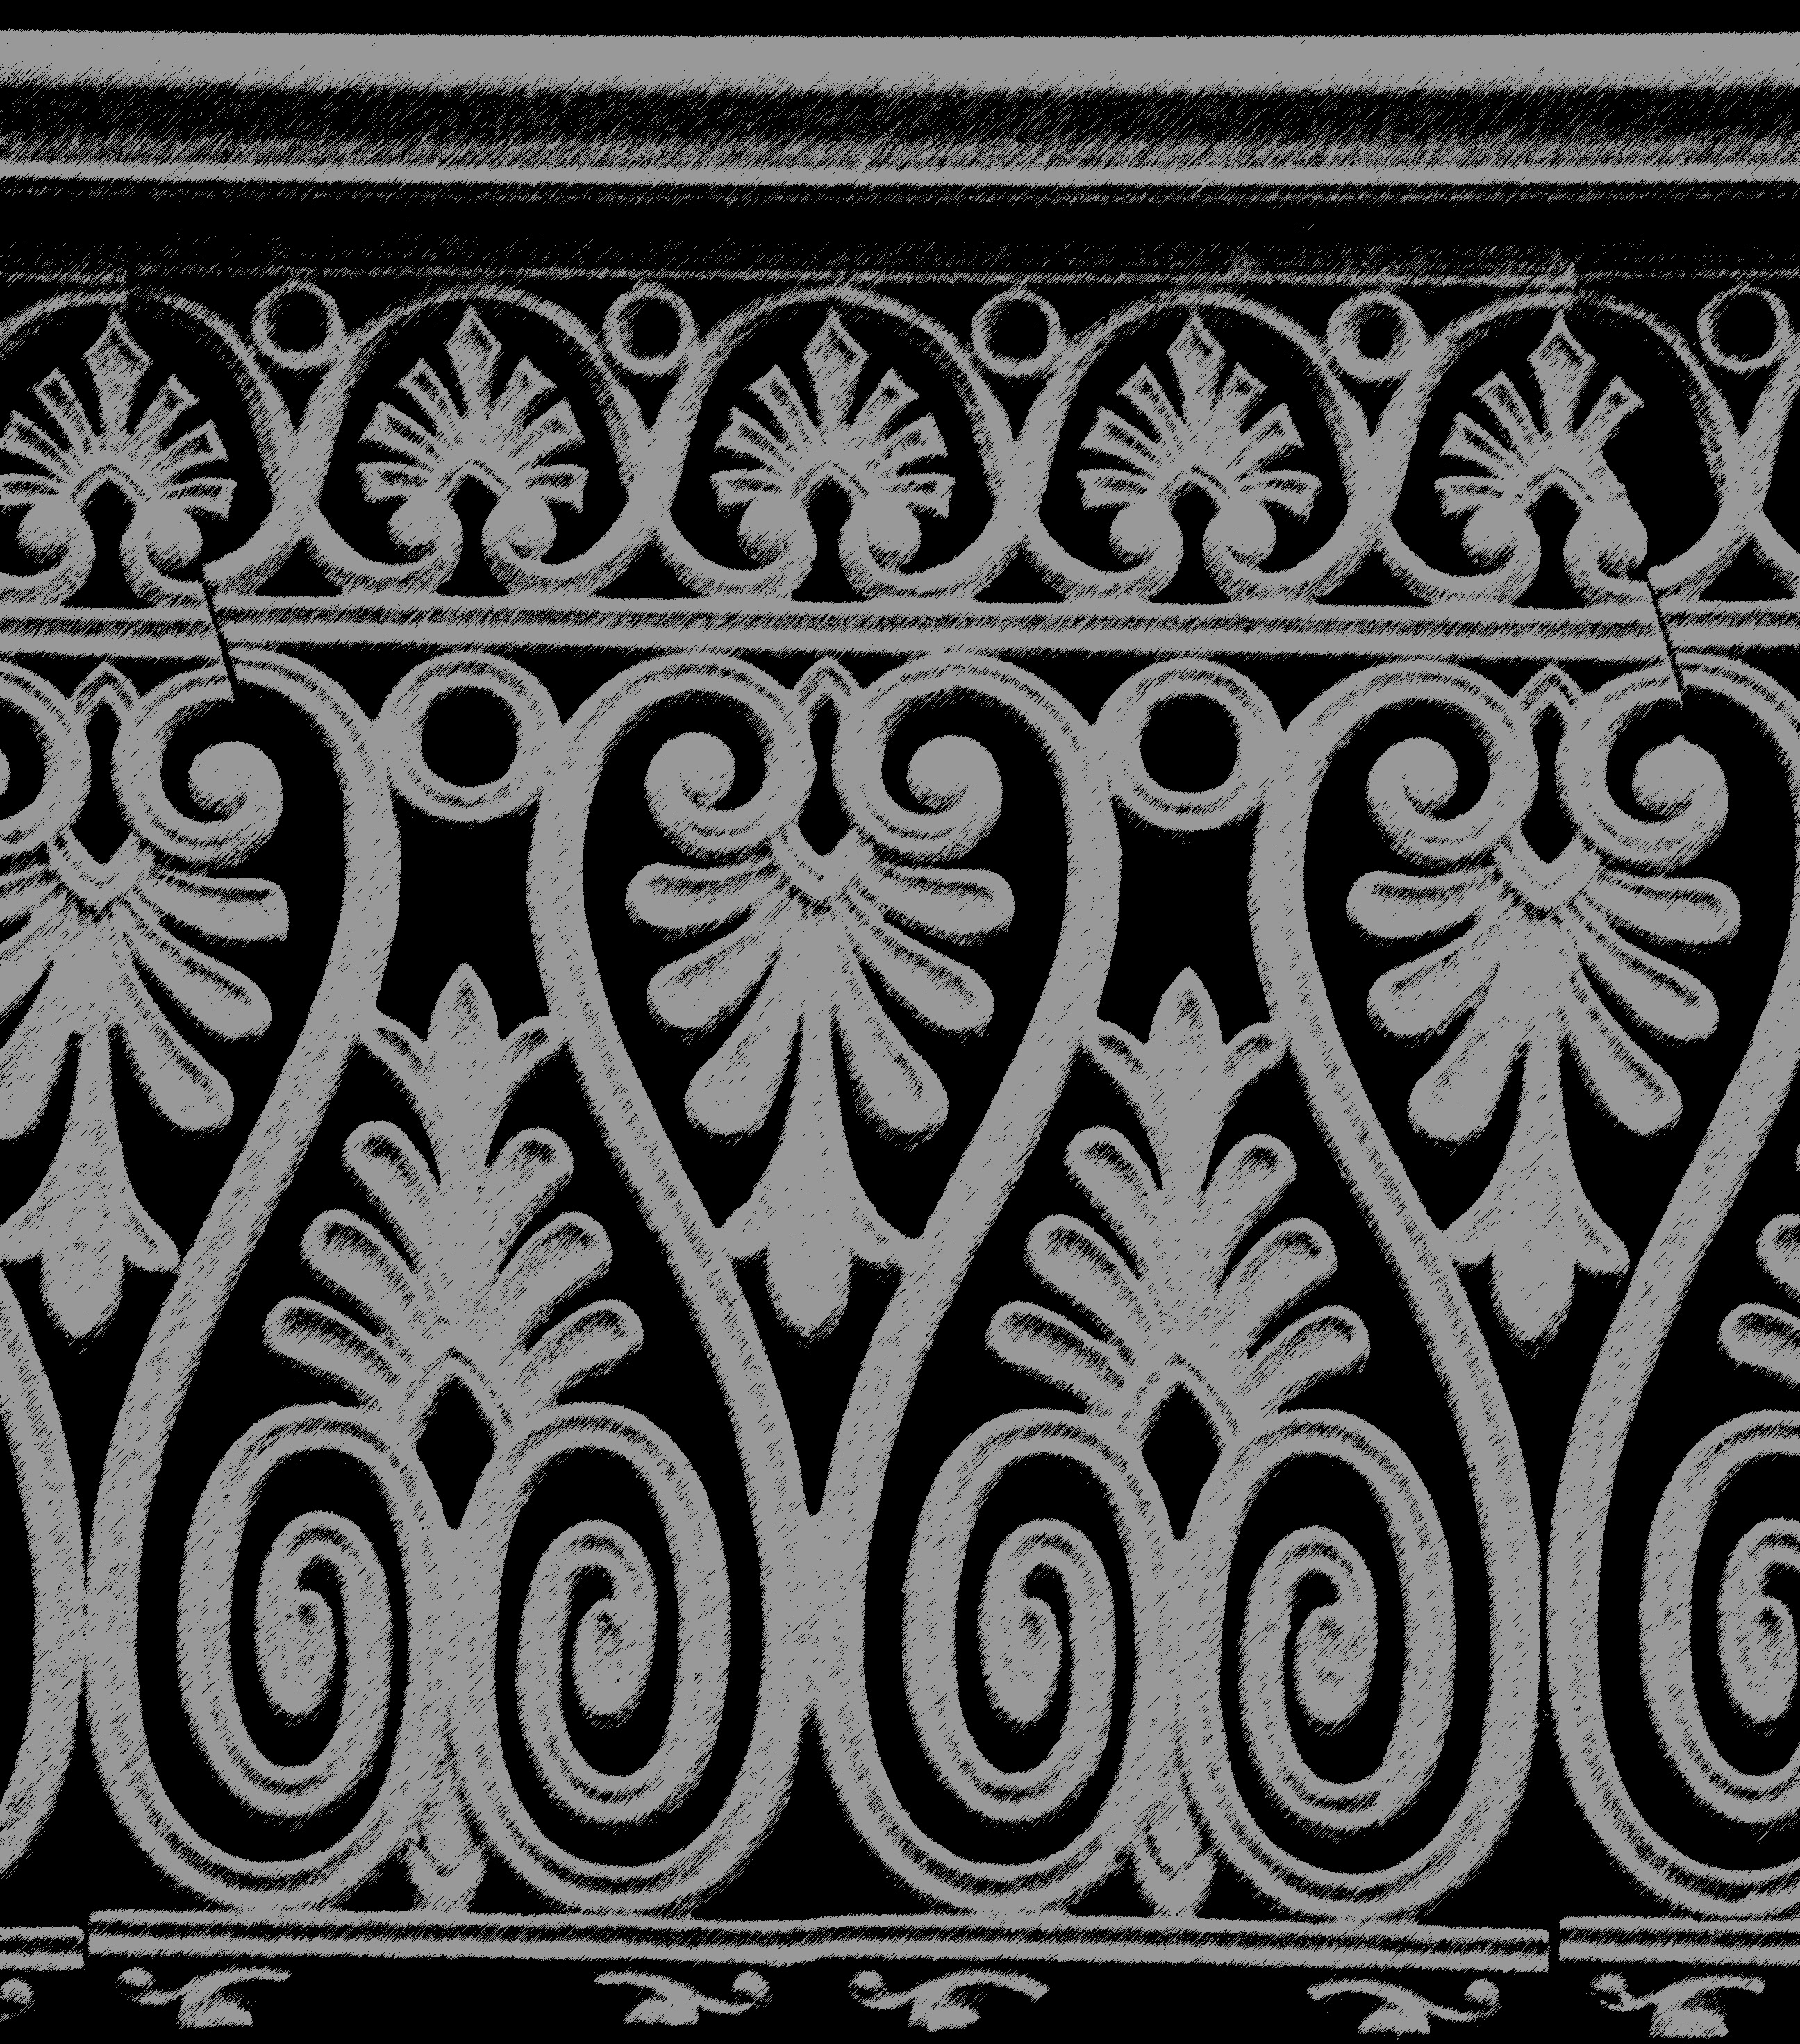 Decorative iron work grunge graphic free backgrounds and grainy image of cast iron decorative fence panels baanklon Choice Image